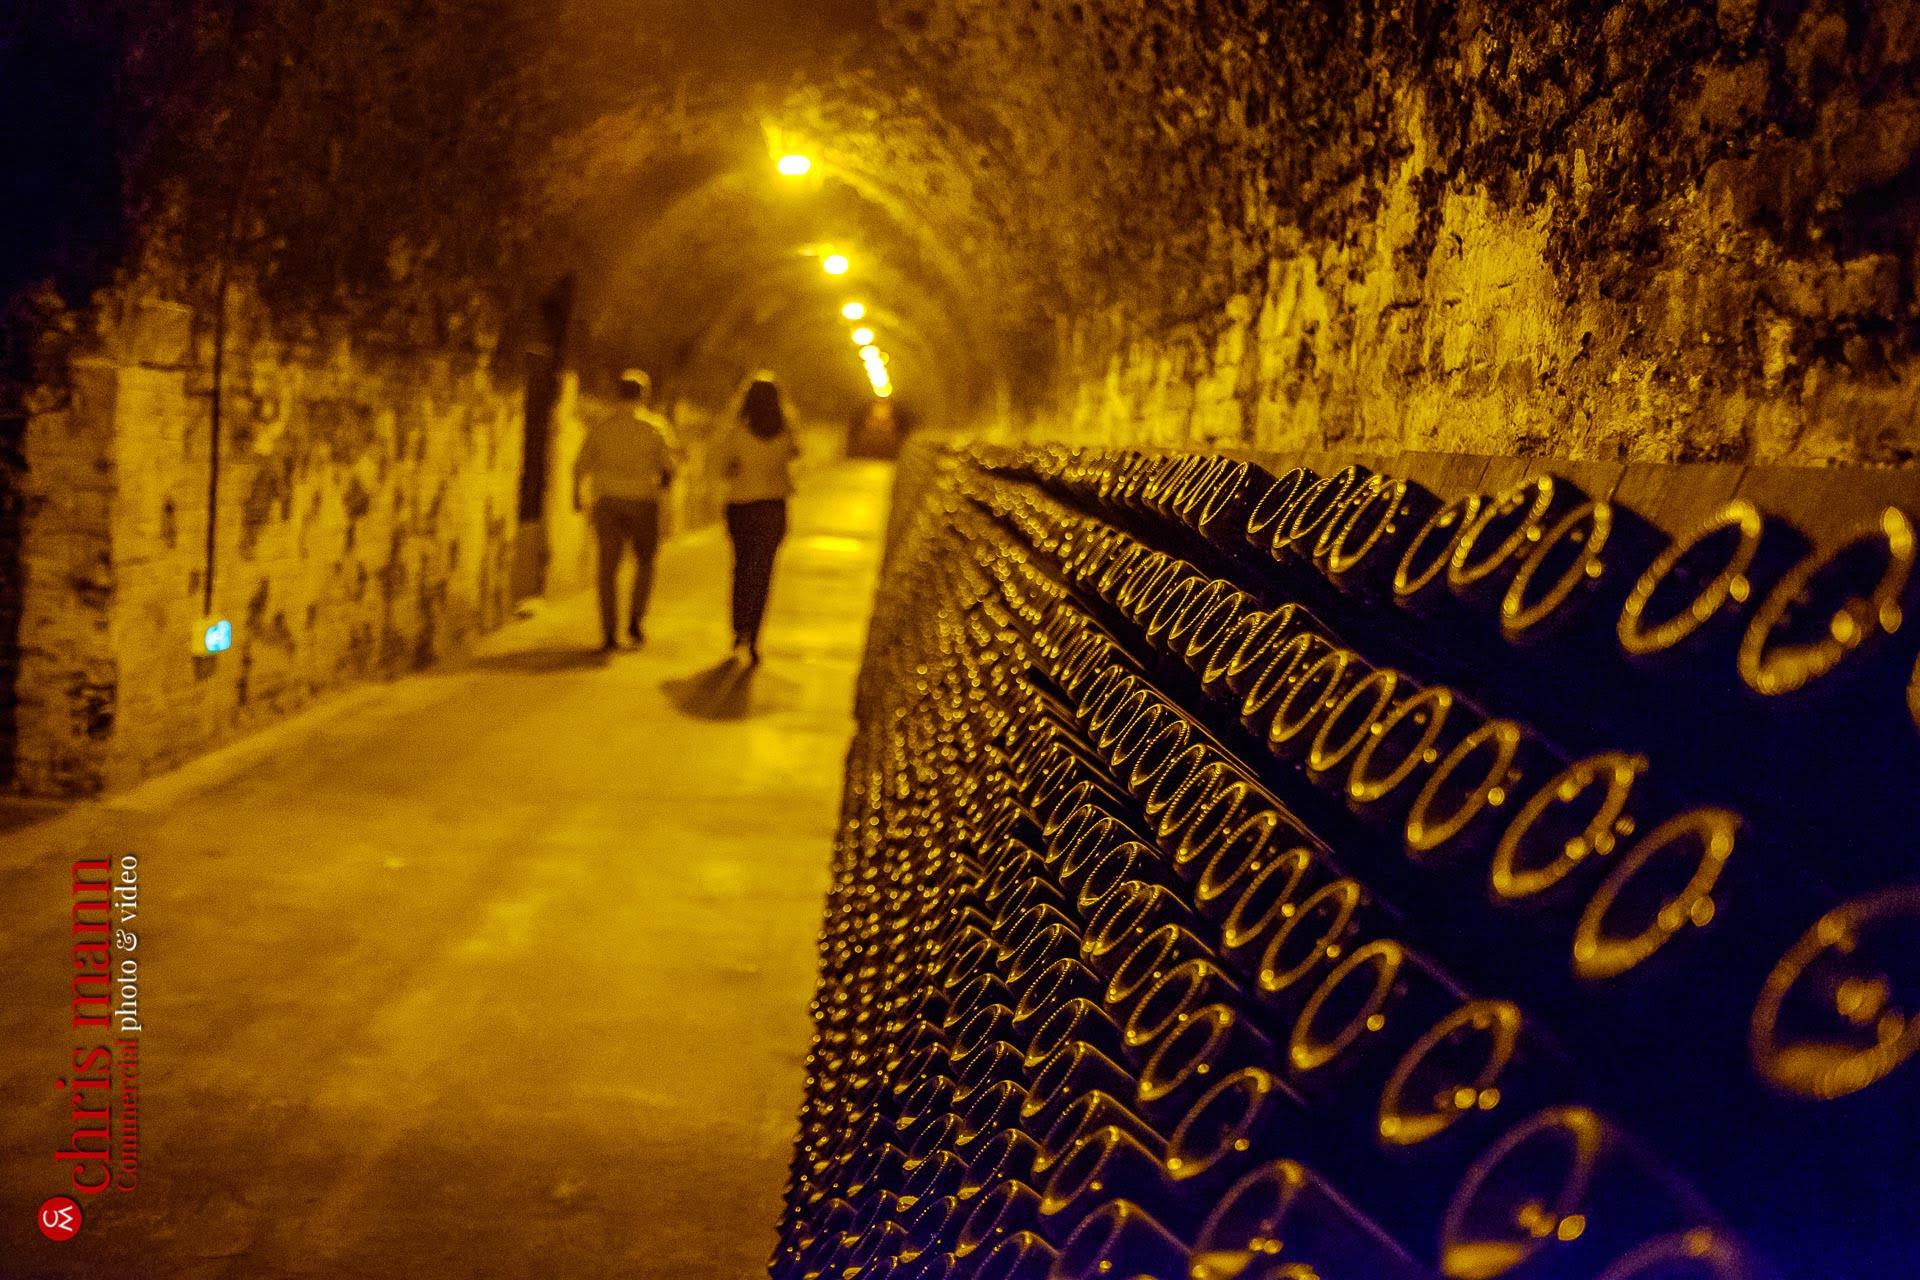 Lanson champagne cellars